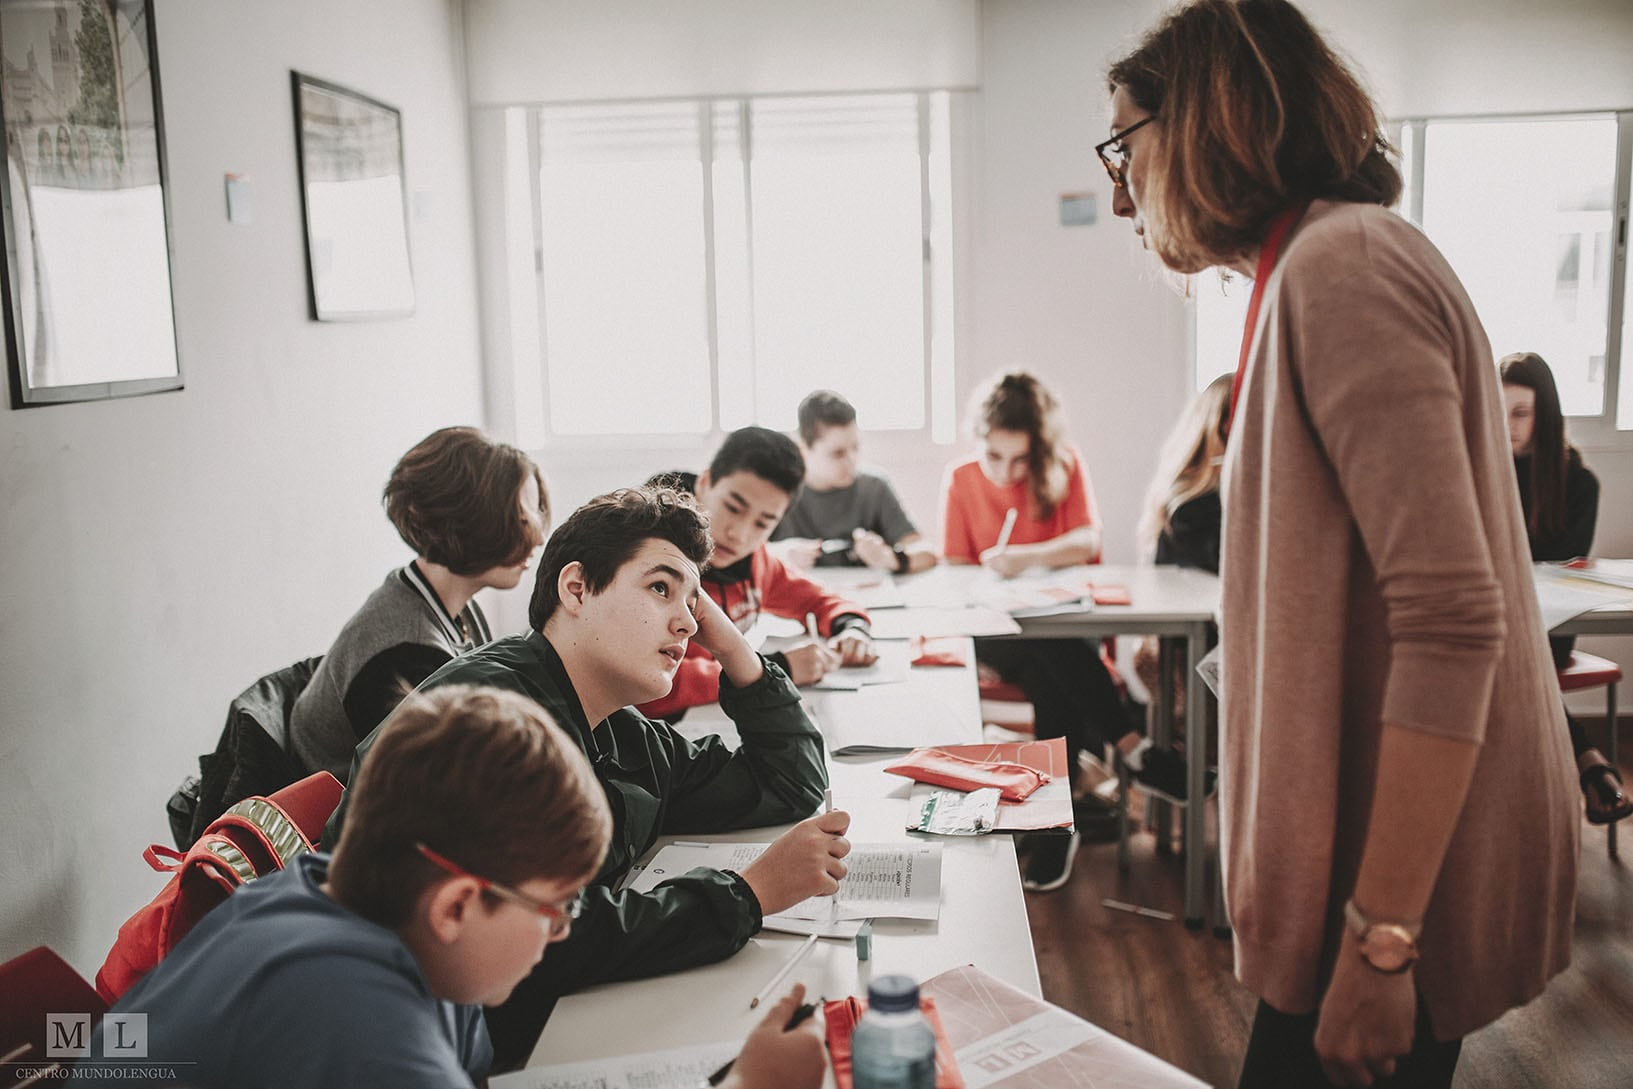 Teaching Spanish grammar